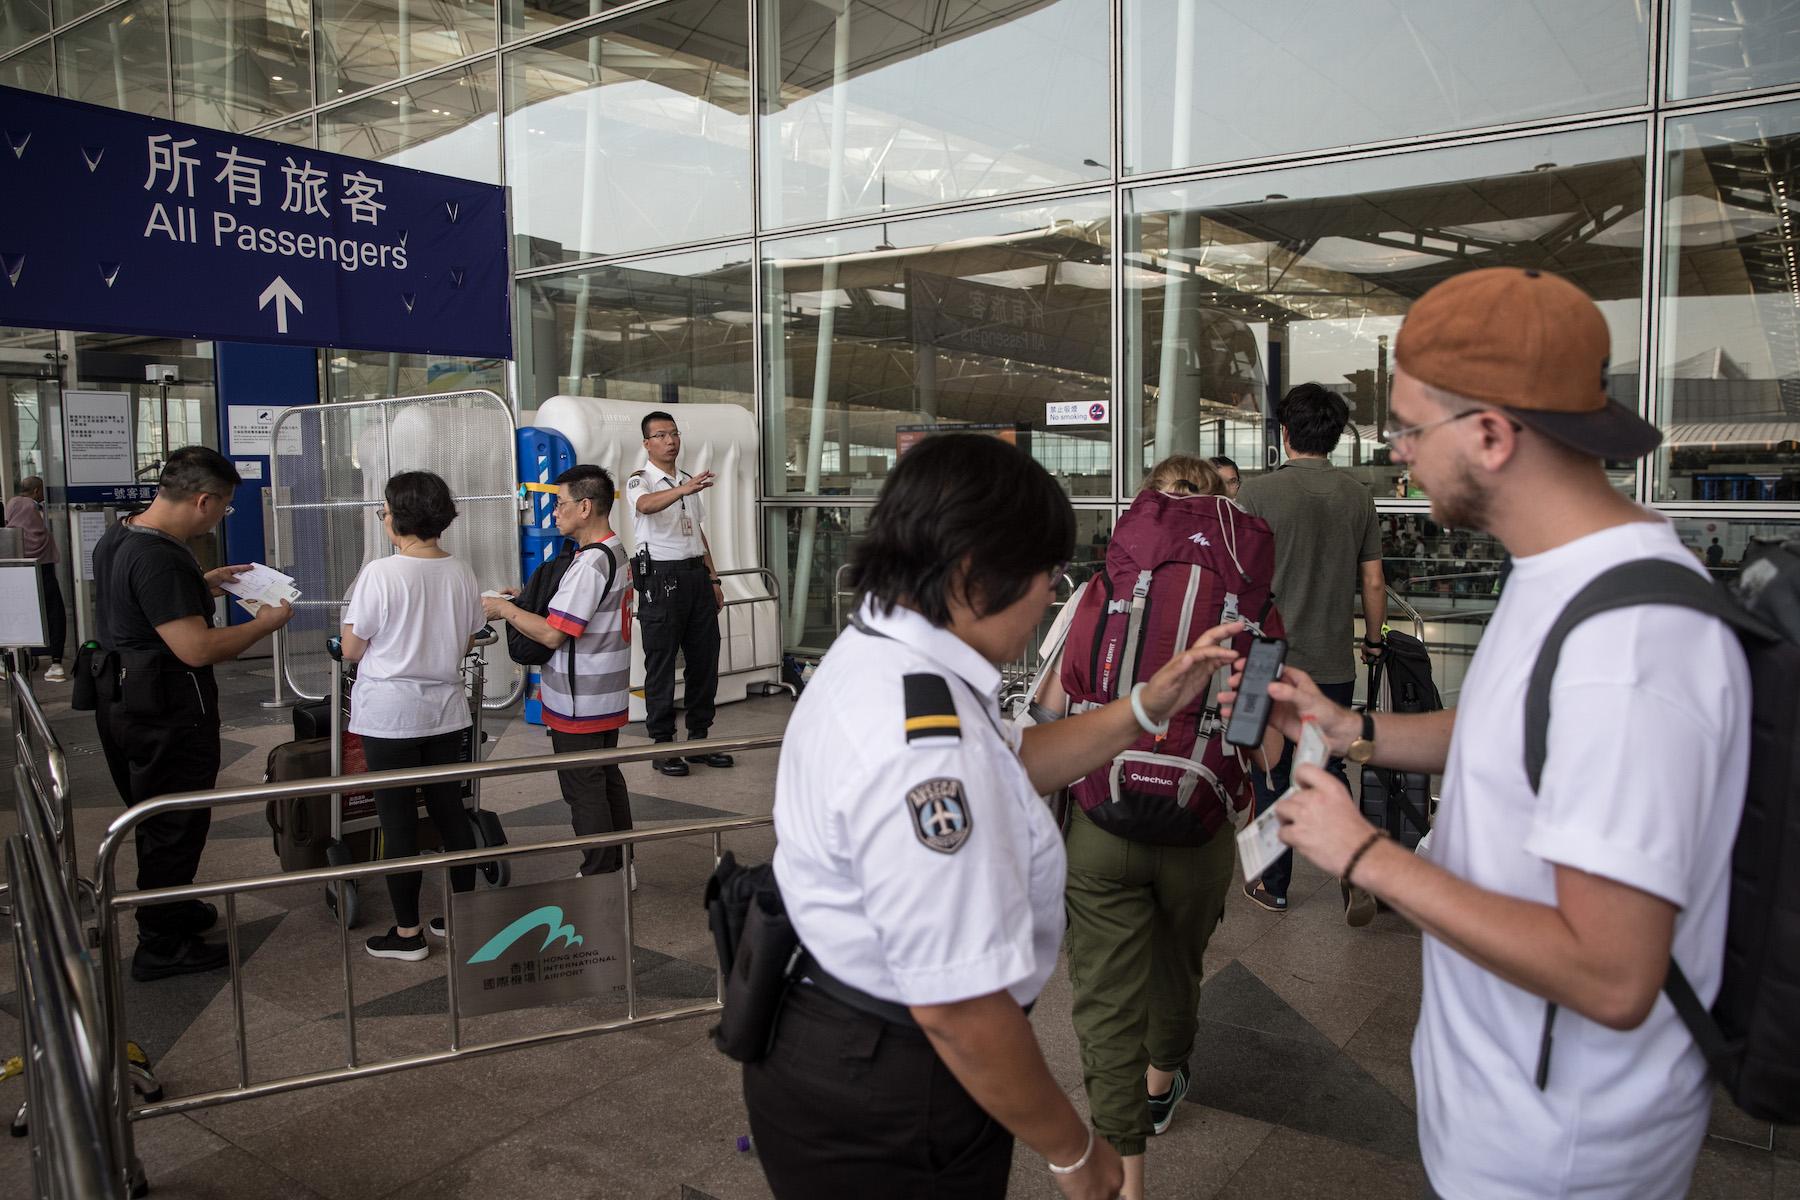 Security staff check passengers boarding passes at the entrance of Hong Kong International Airport